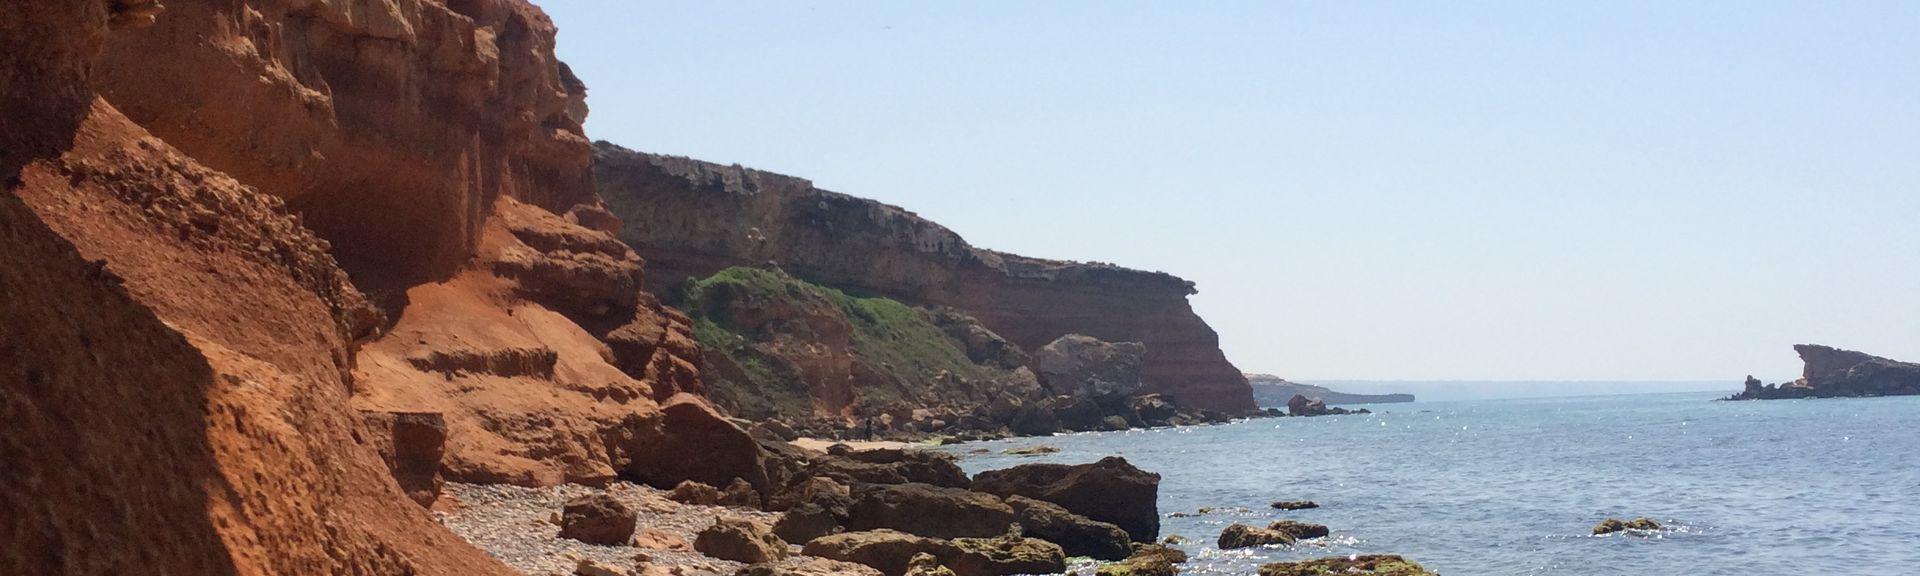 Saidia Beach, Saidia, Morocco